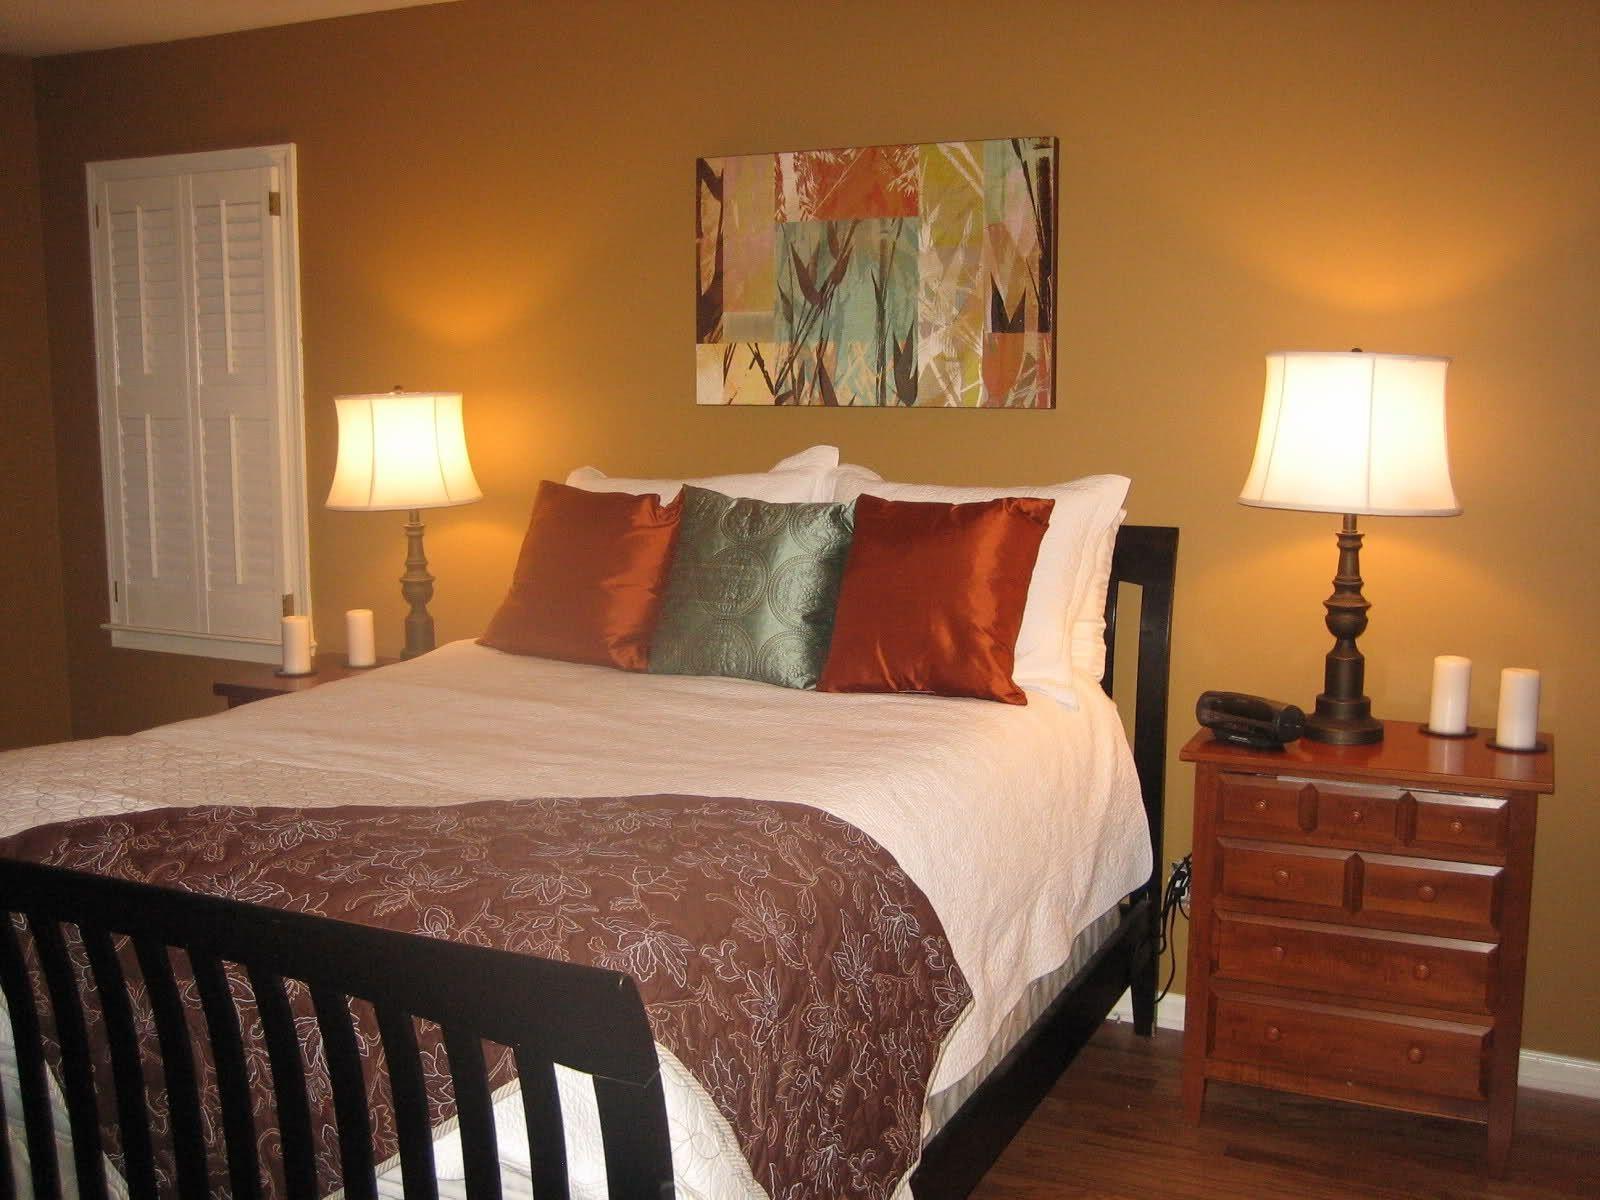 Rec maras en color ocre pintura cuartos pinterest - Habitaciones color naranja ...